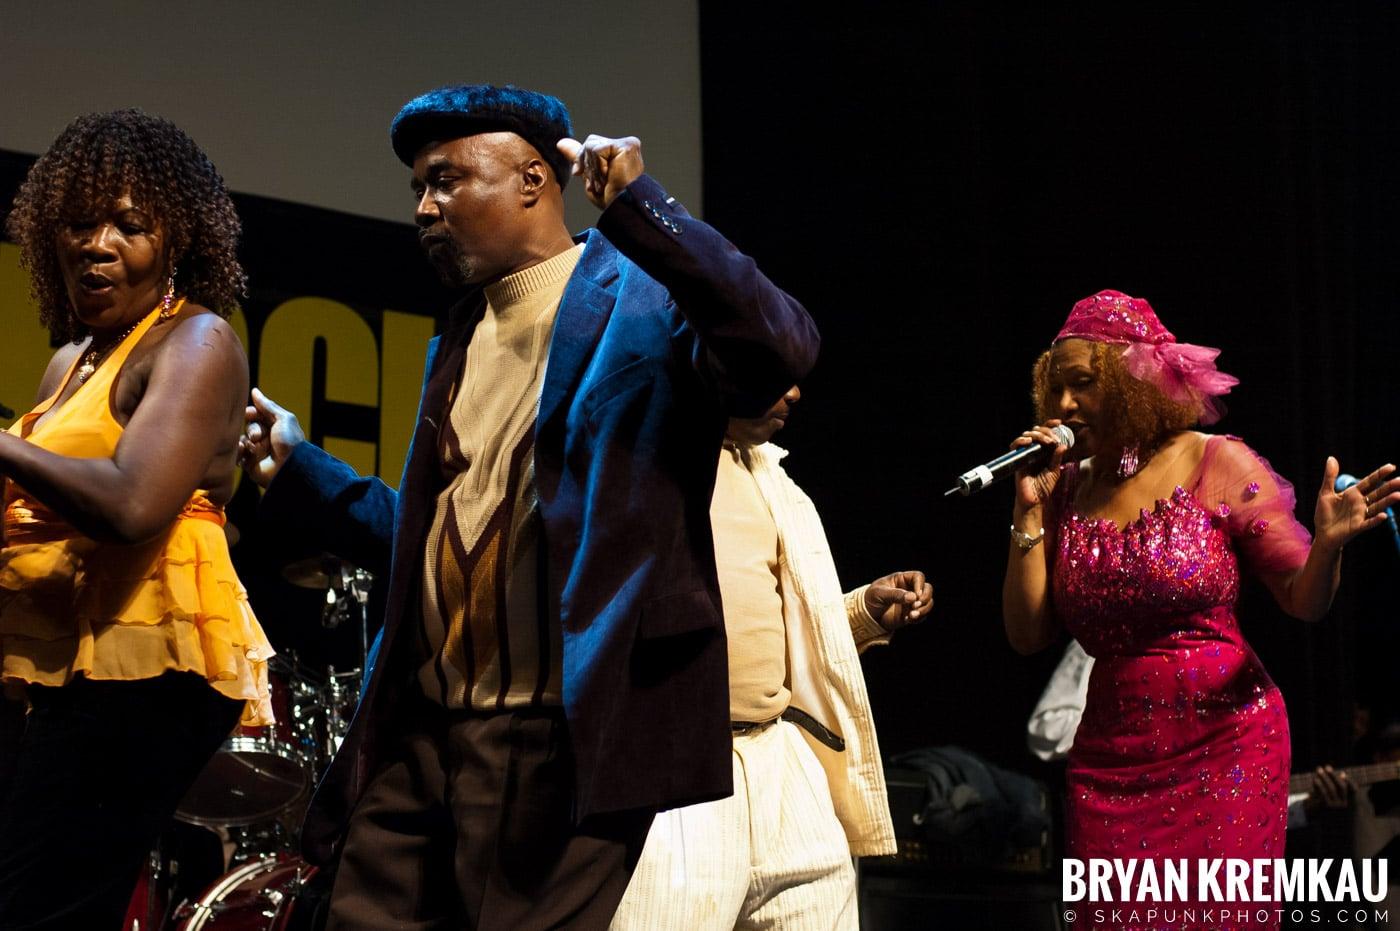 Marcia Griffiths @ Vintage Reggae Fest - Hammerstein Ballroom, NYC - 12.16.2007 (2)